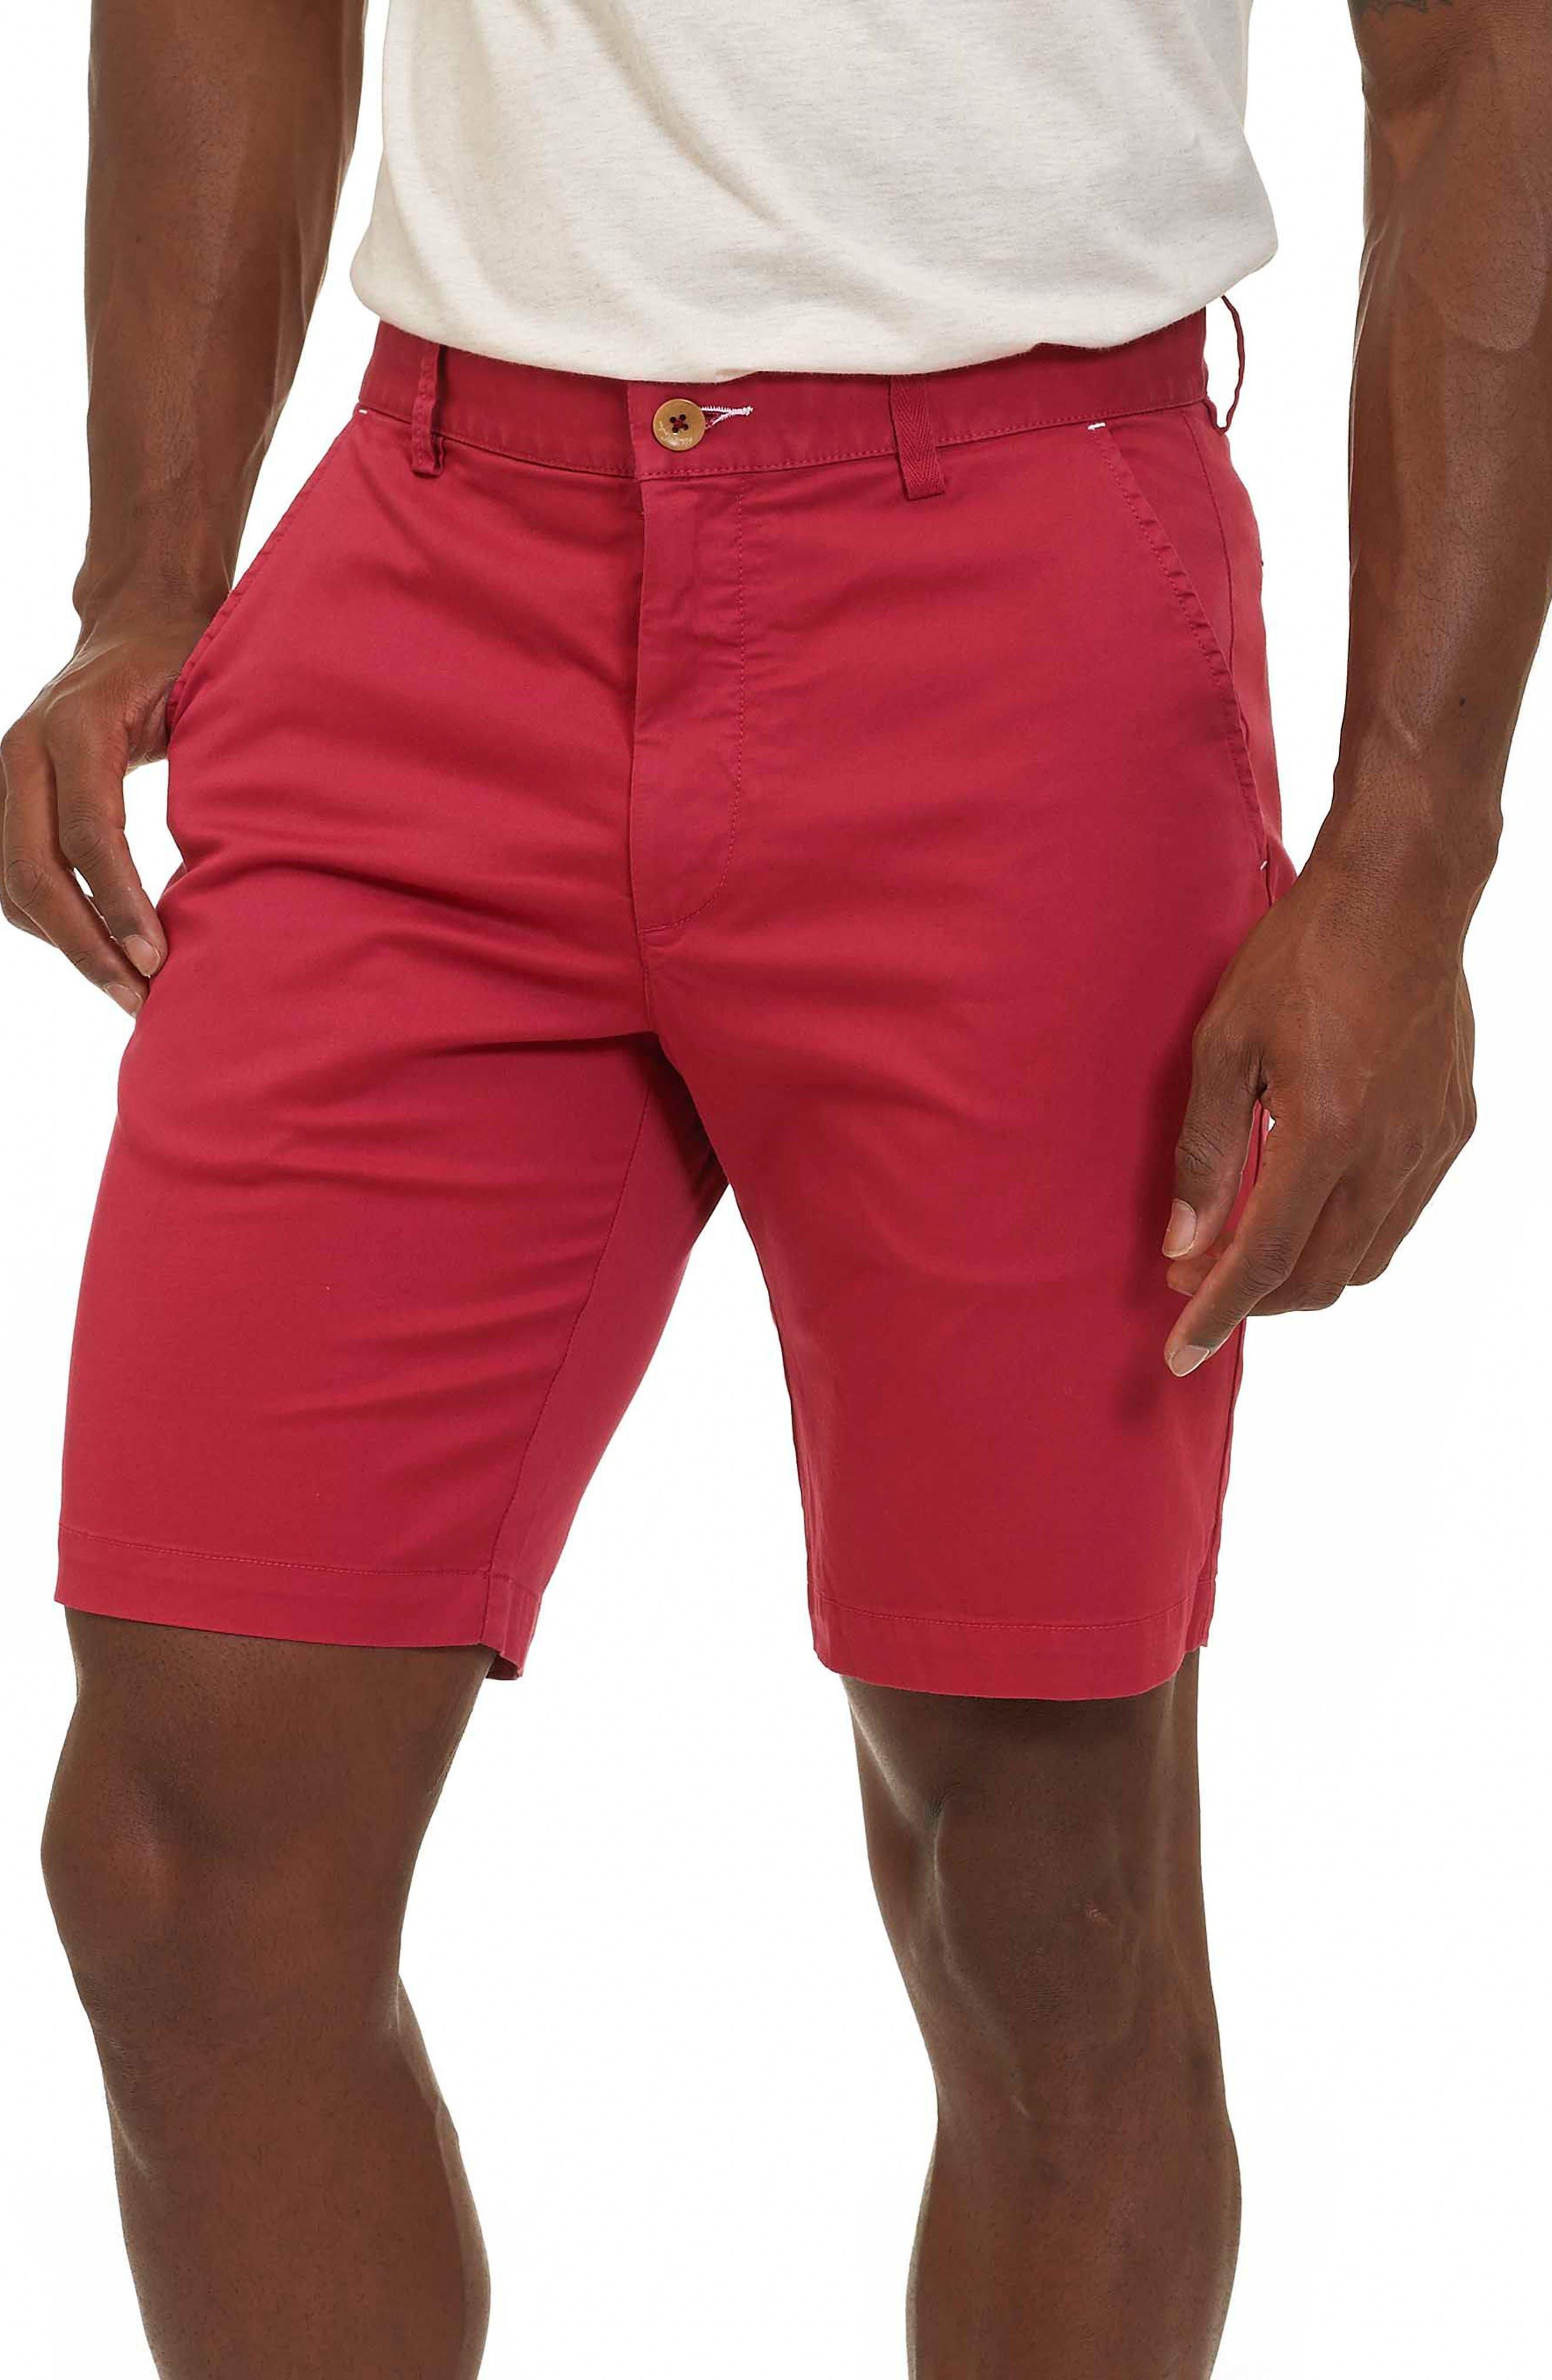 Pioneer Shorts,                             Main thumbnail 1, color,                             Berry